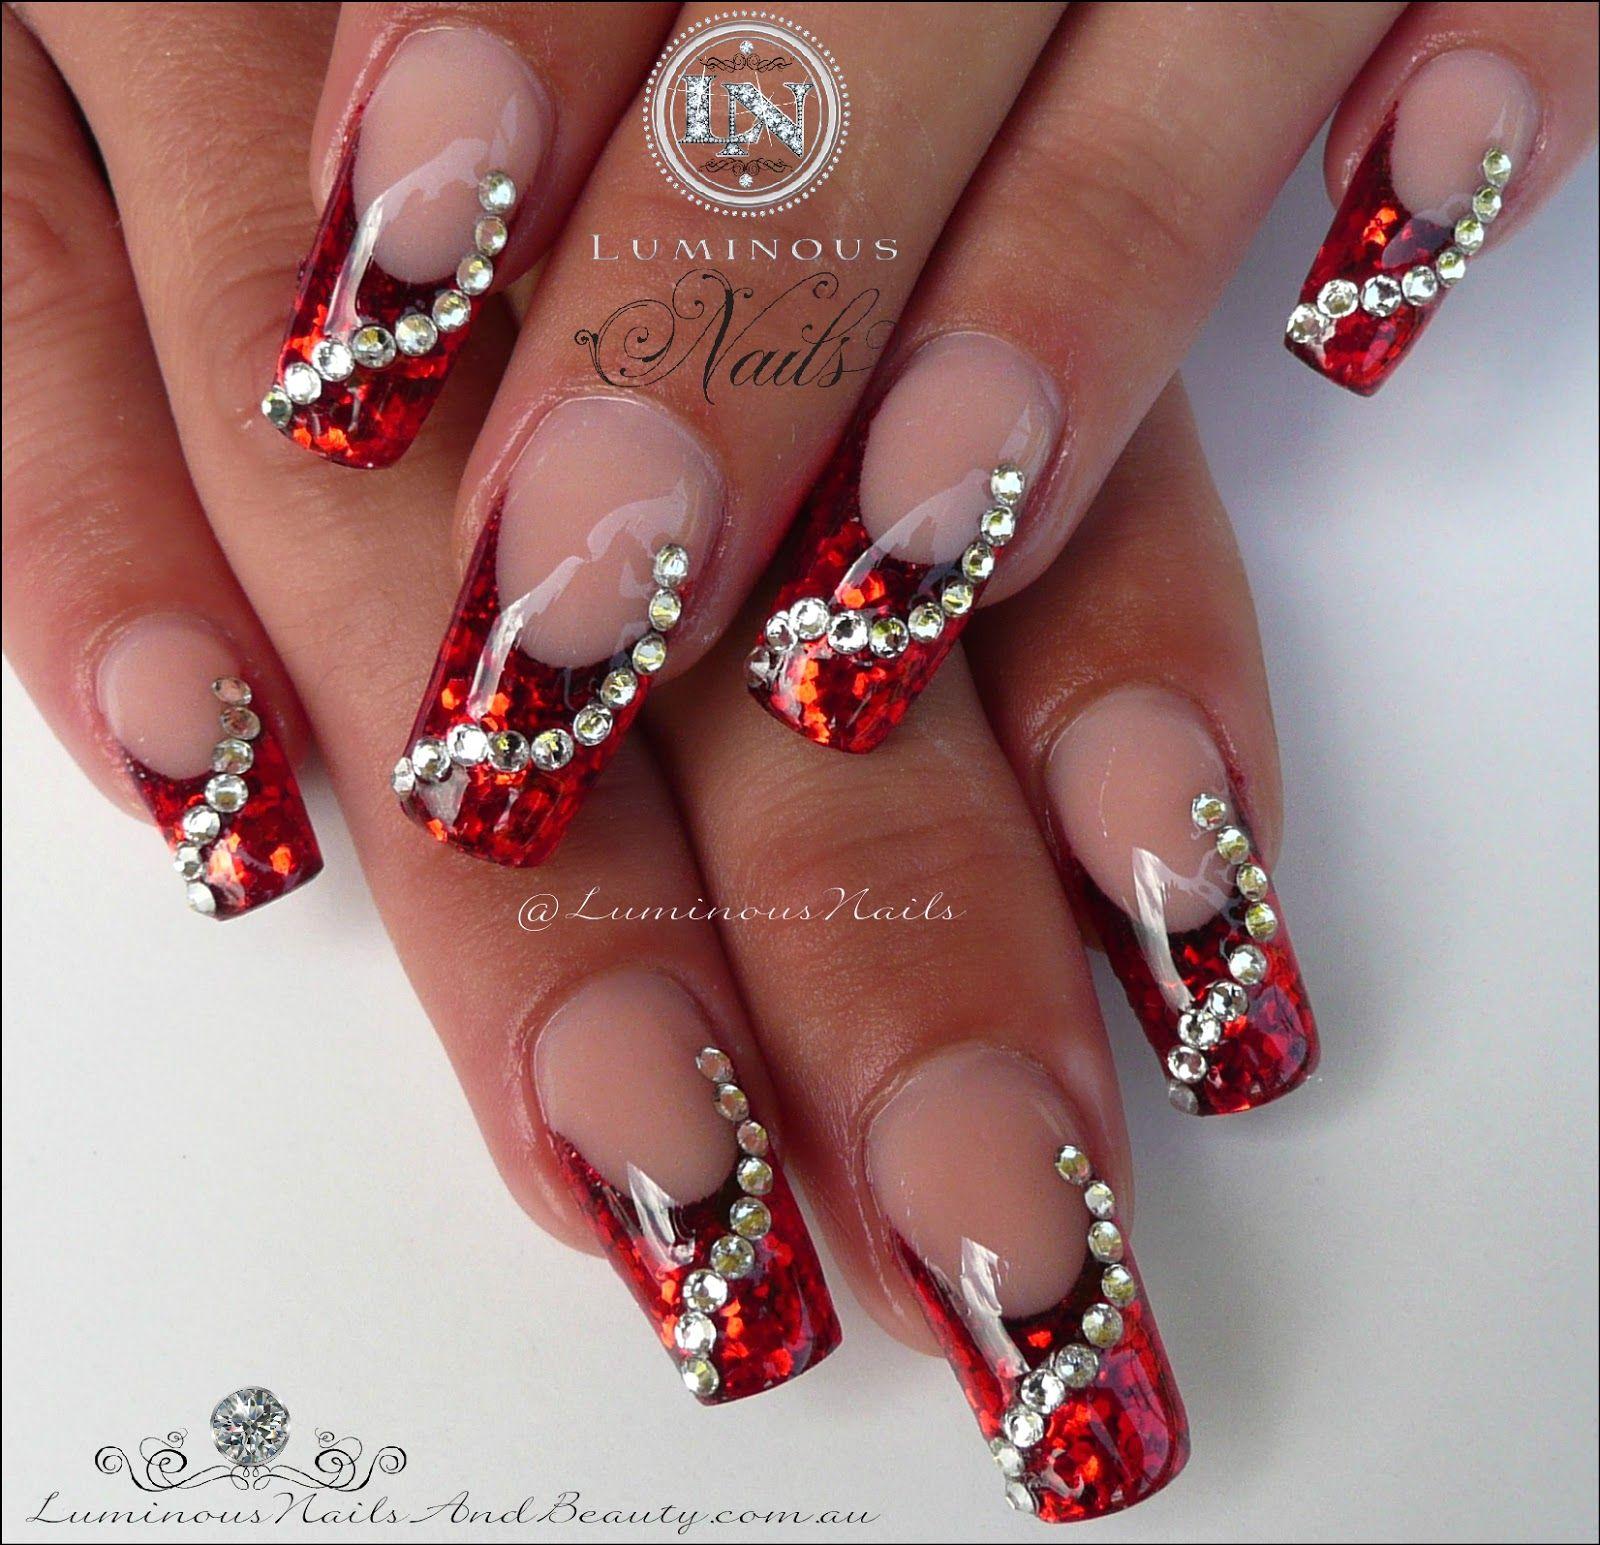 luminous nails beauty gold coast qld glitter red. Black Bedroom Furniture Sets. Home Design Ideas